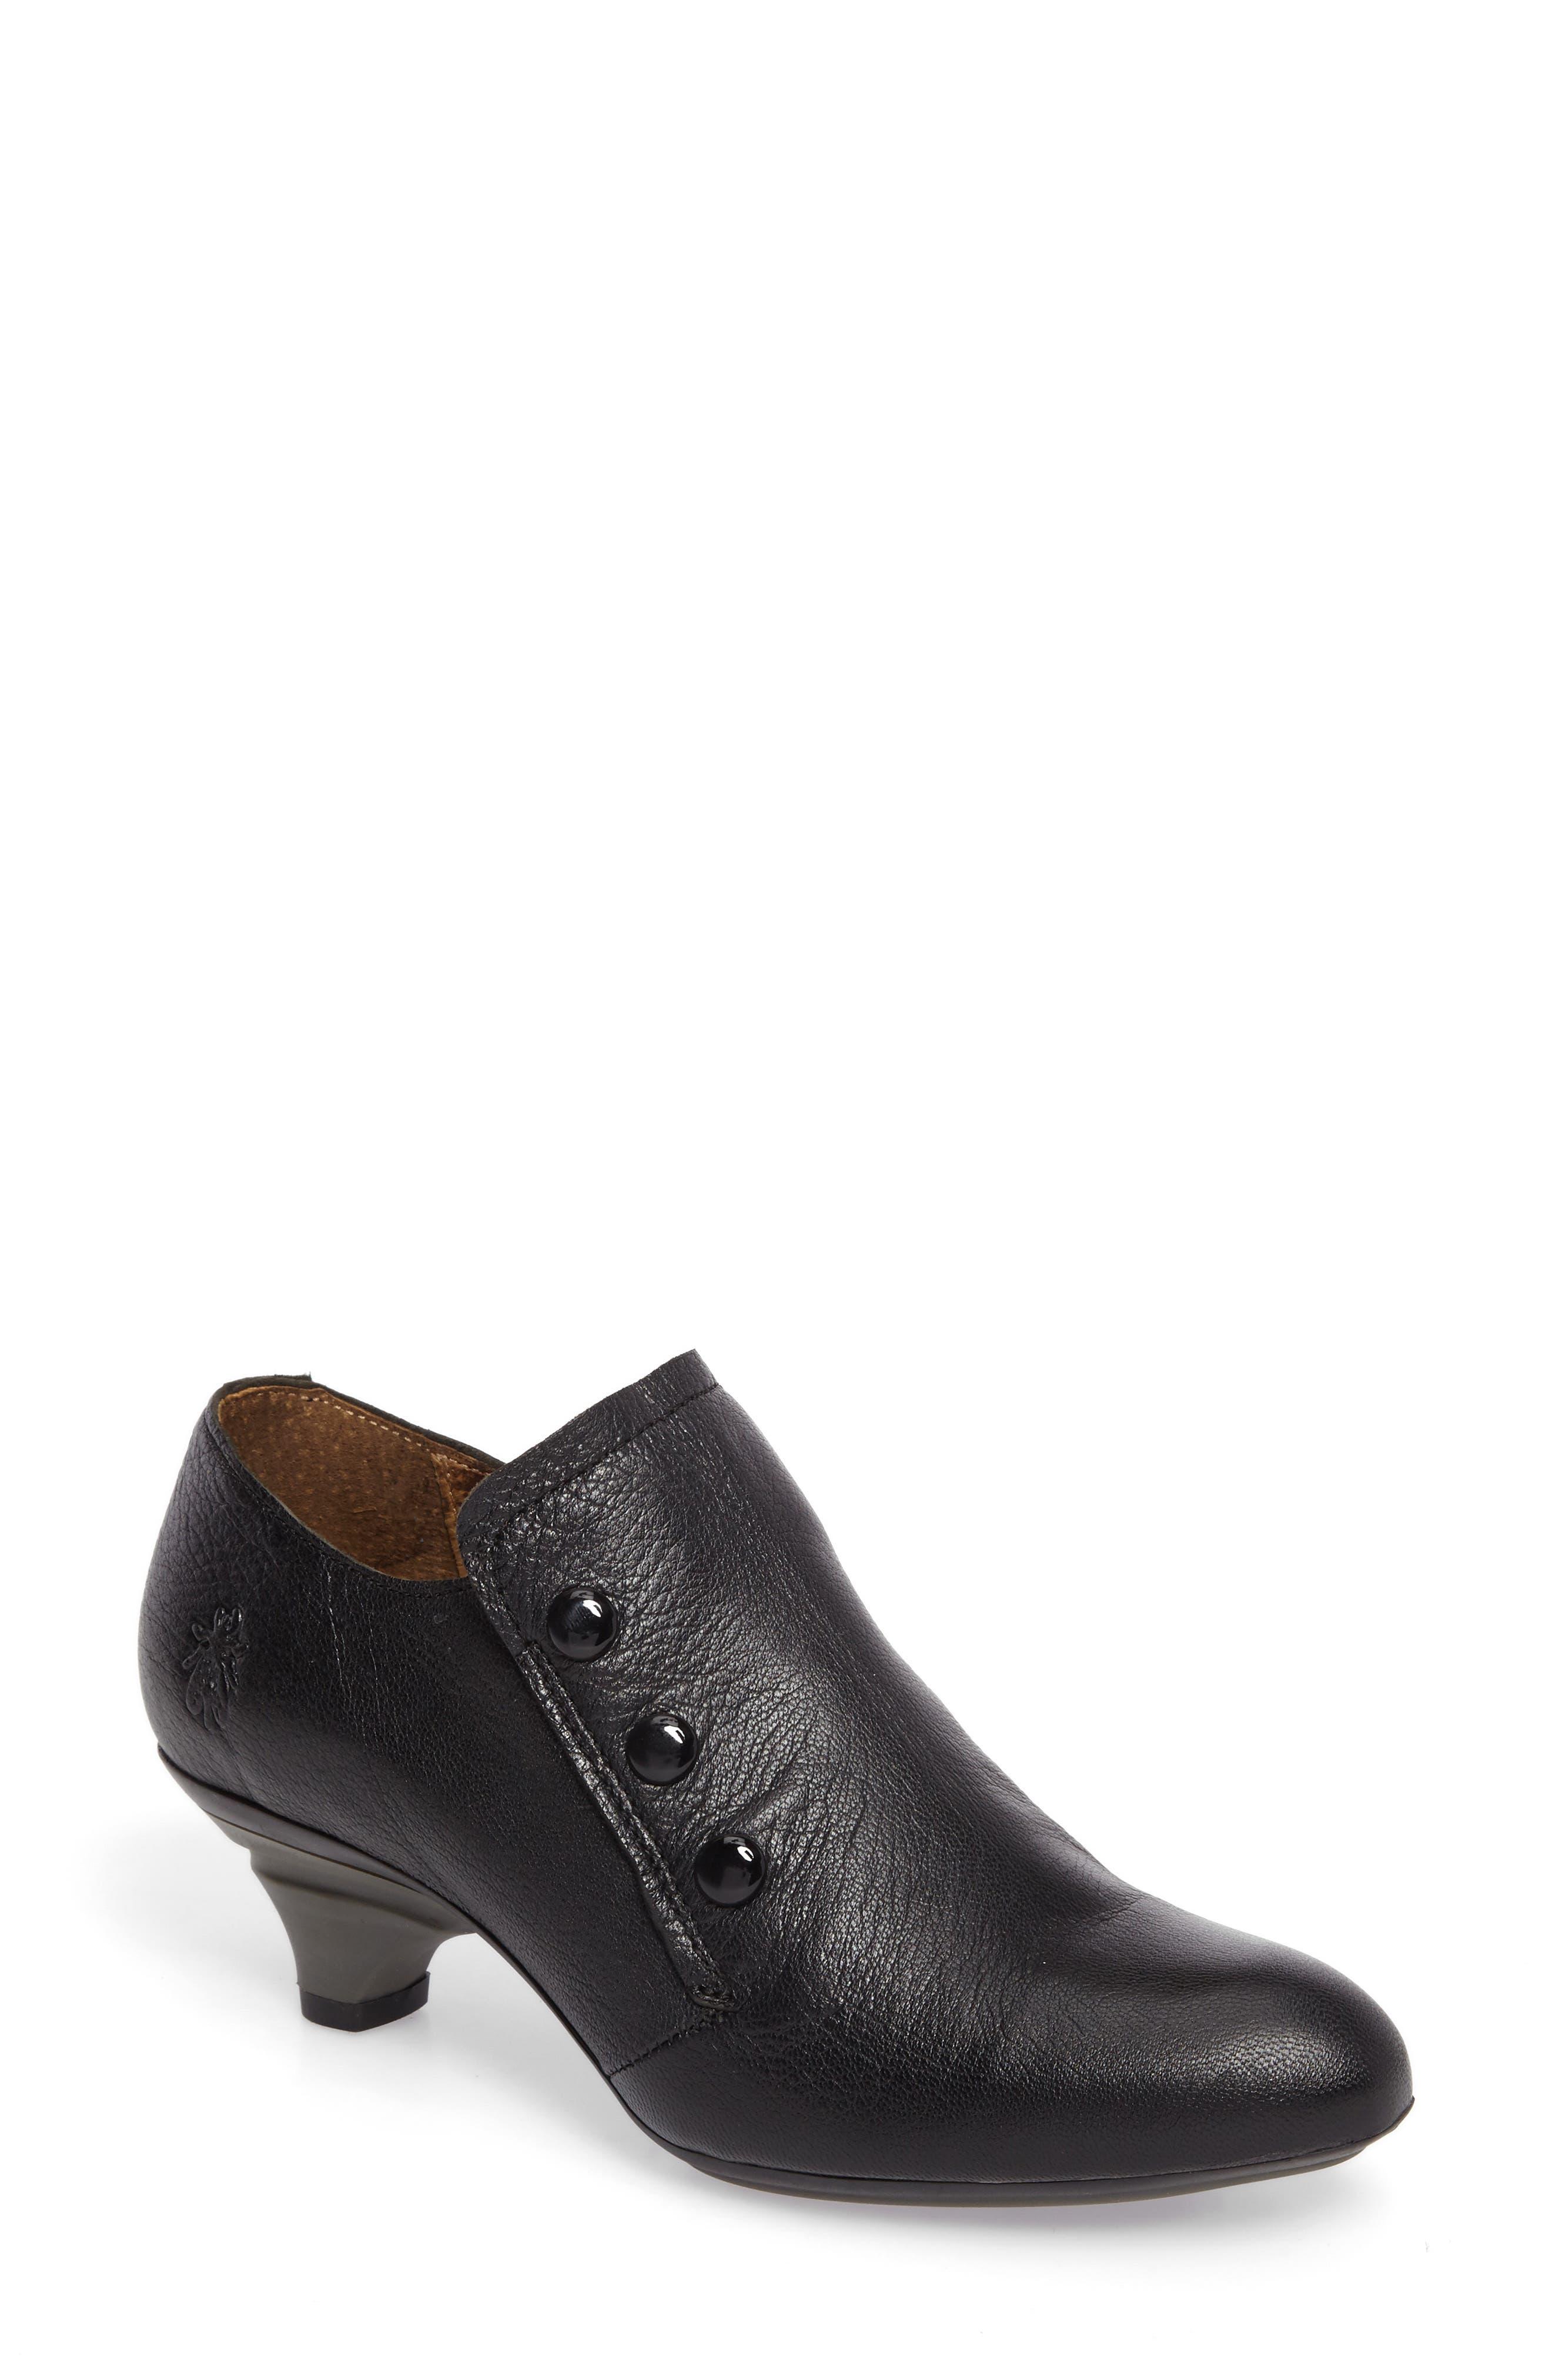 Baff Kitten Heel Pump,                         Main,                         color, Black Leather